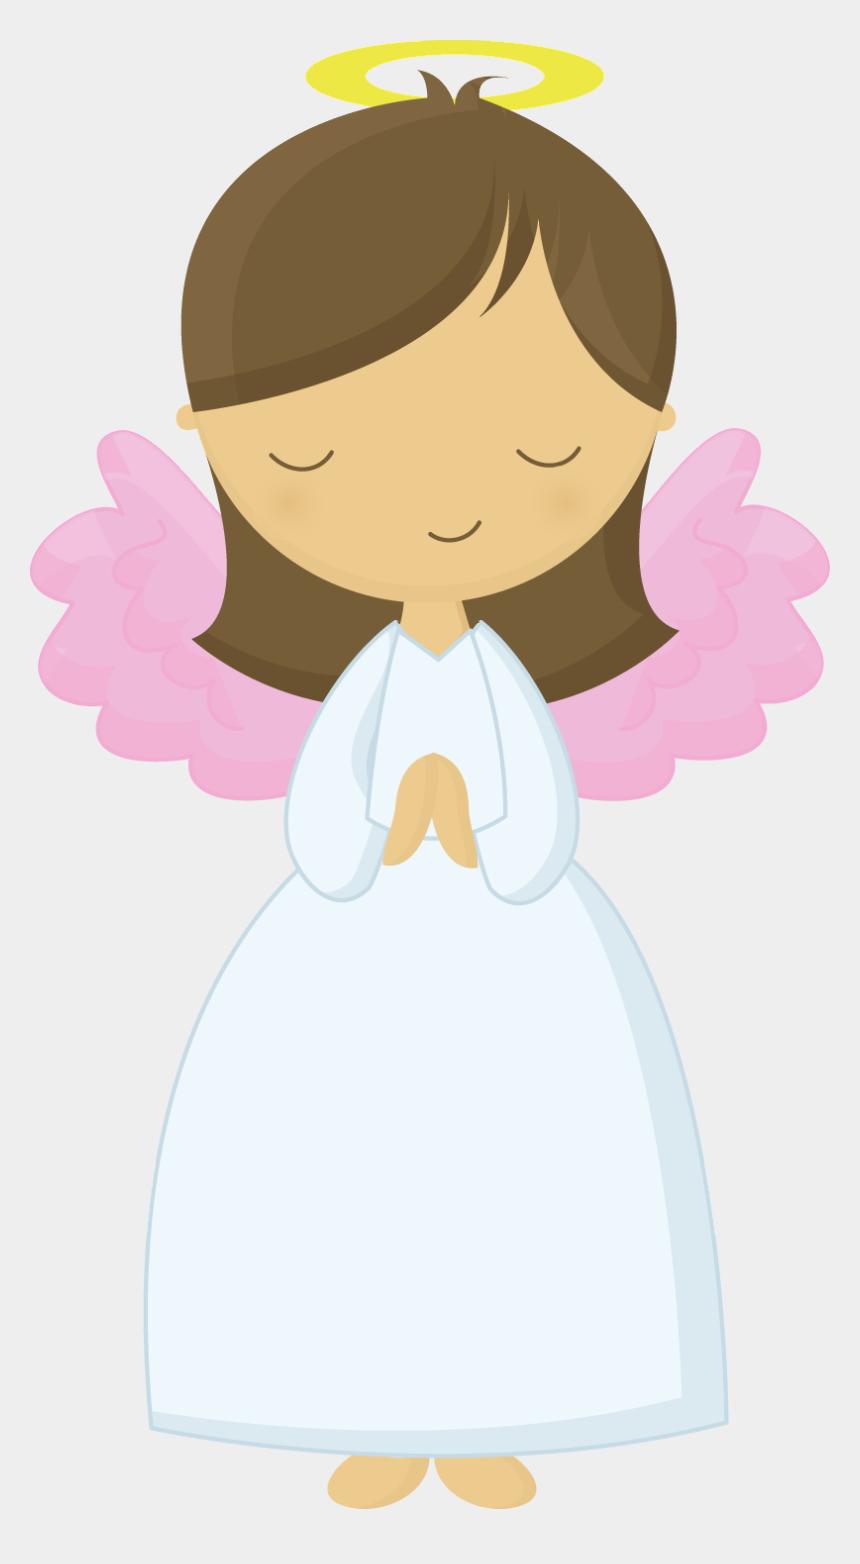 cruz bautizo clipart, Cartoons - Barnedåb, Cricut, Clip Art, Første Hellige Kommunion, - Little Angel Clipart Png